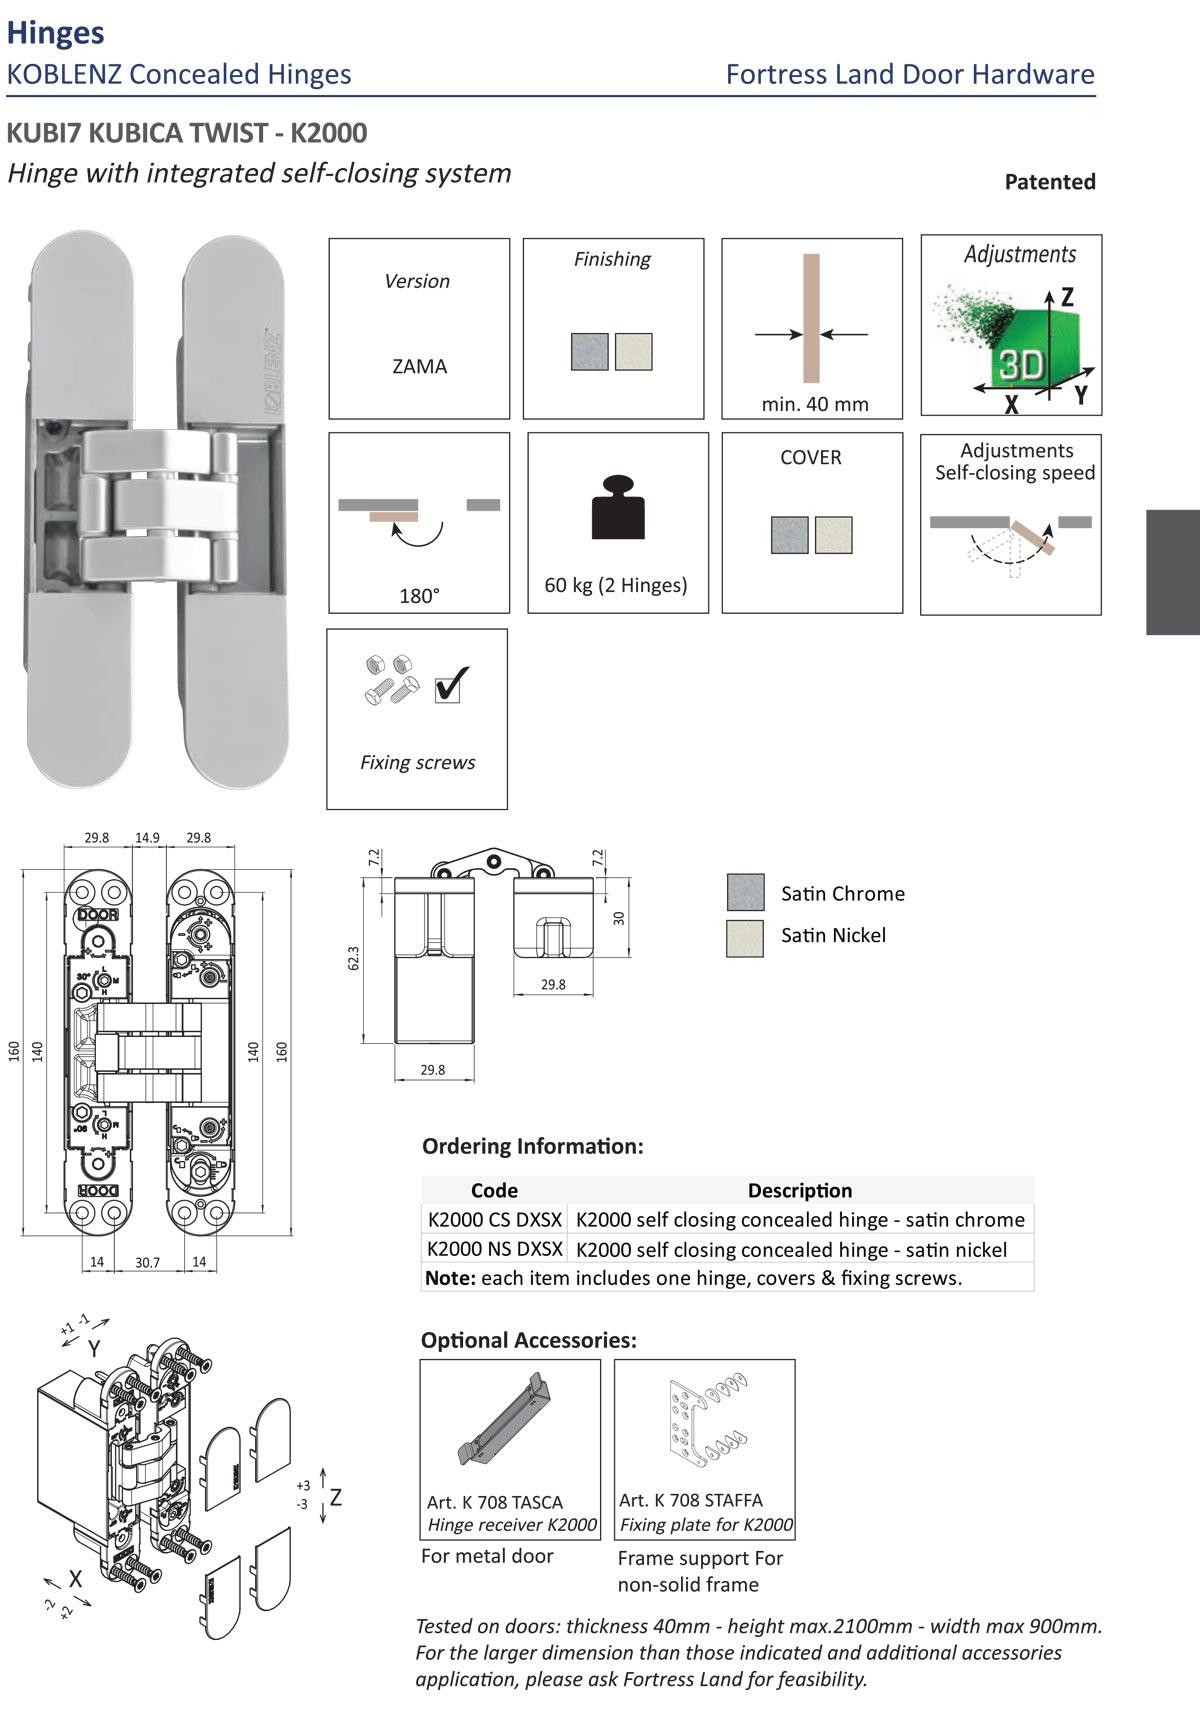 compact hinge, agb hinge, italian hinge, easy hinge, easy install hinge, easy adjustment door hinge, door hinge, steel hinge, indoor hinge, interior door hinge, Fortress land Security Company, Yangon, Myanmar